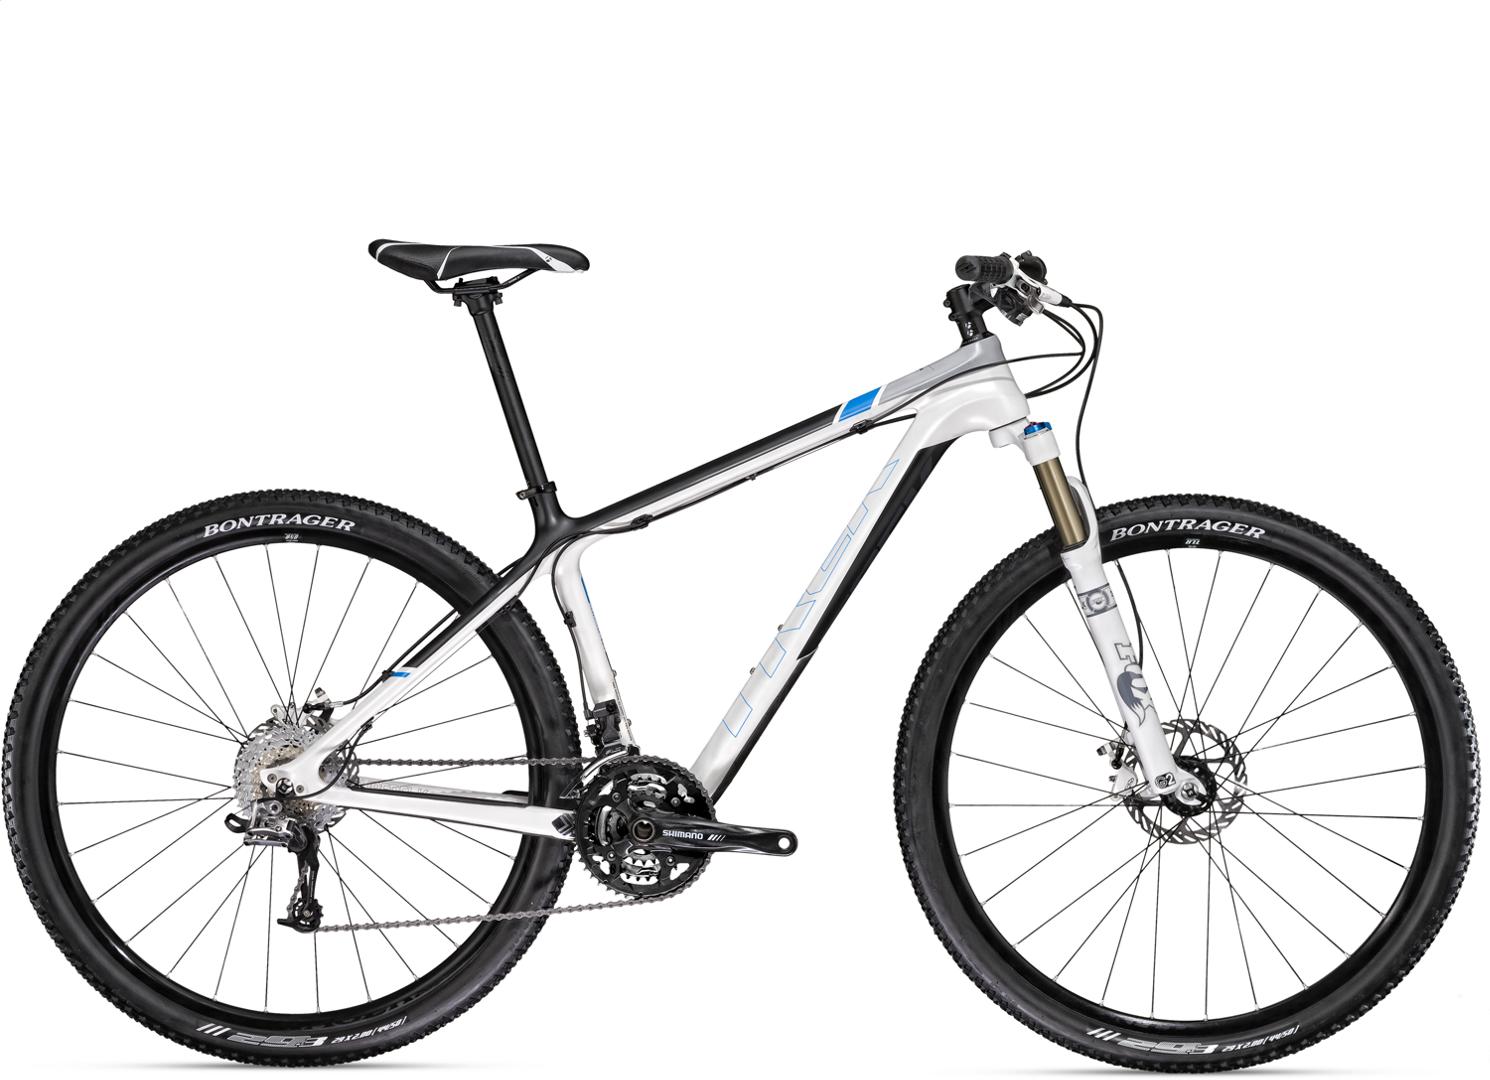 2011 Trek Superfly Hardtail Carbon 29er Trek Bicycle Trek Bikes